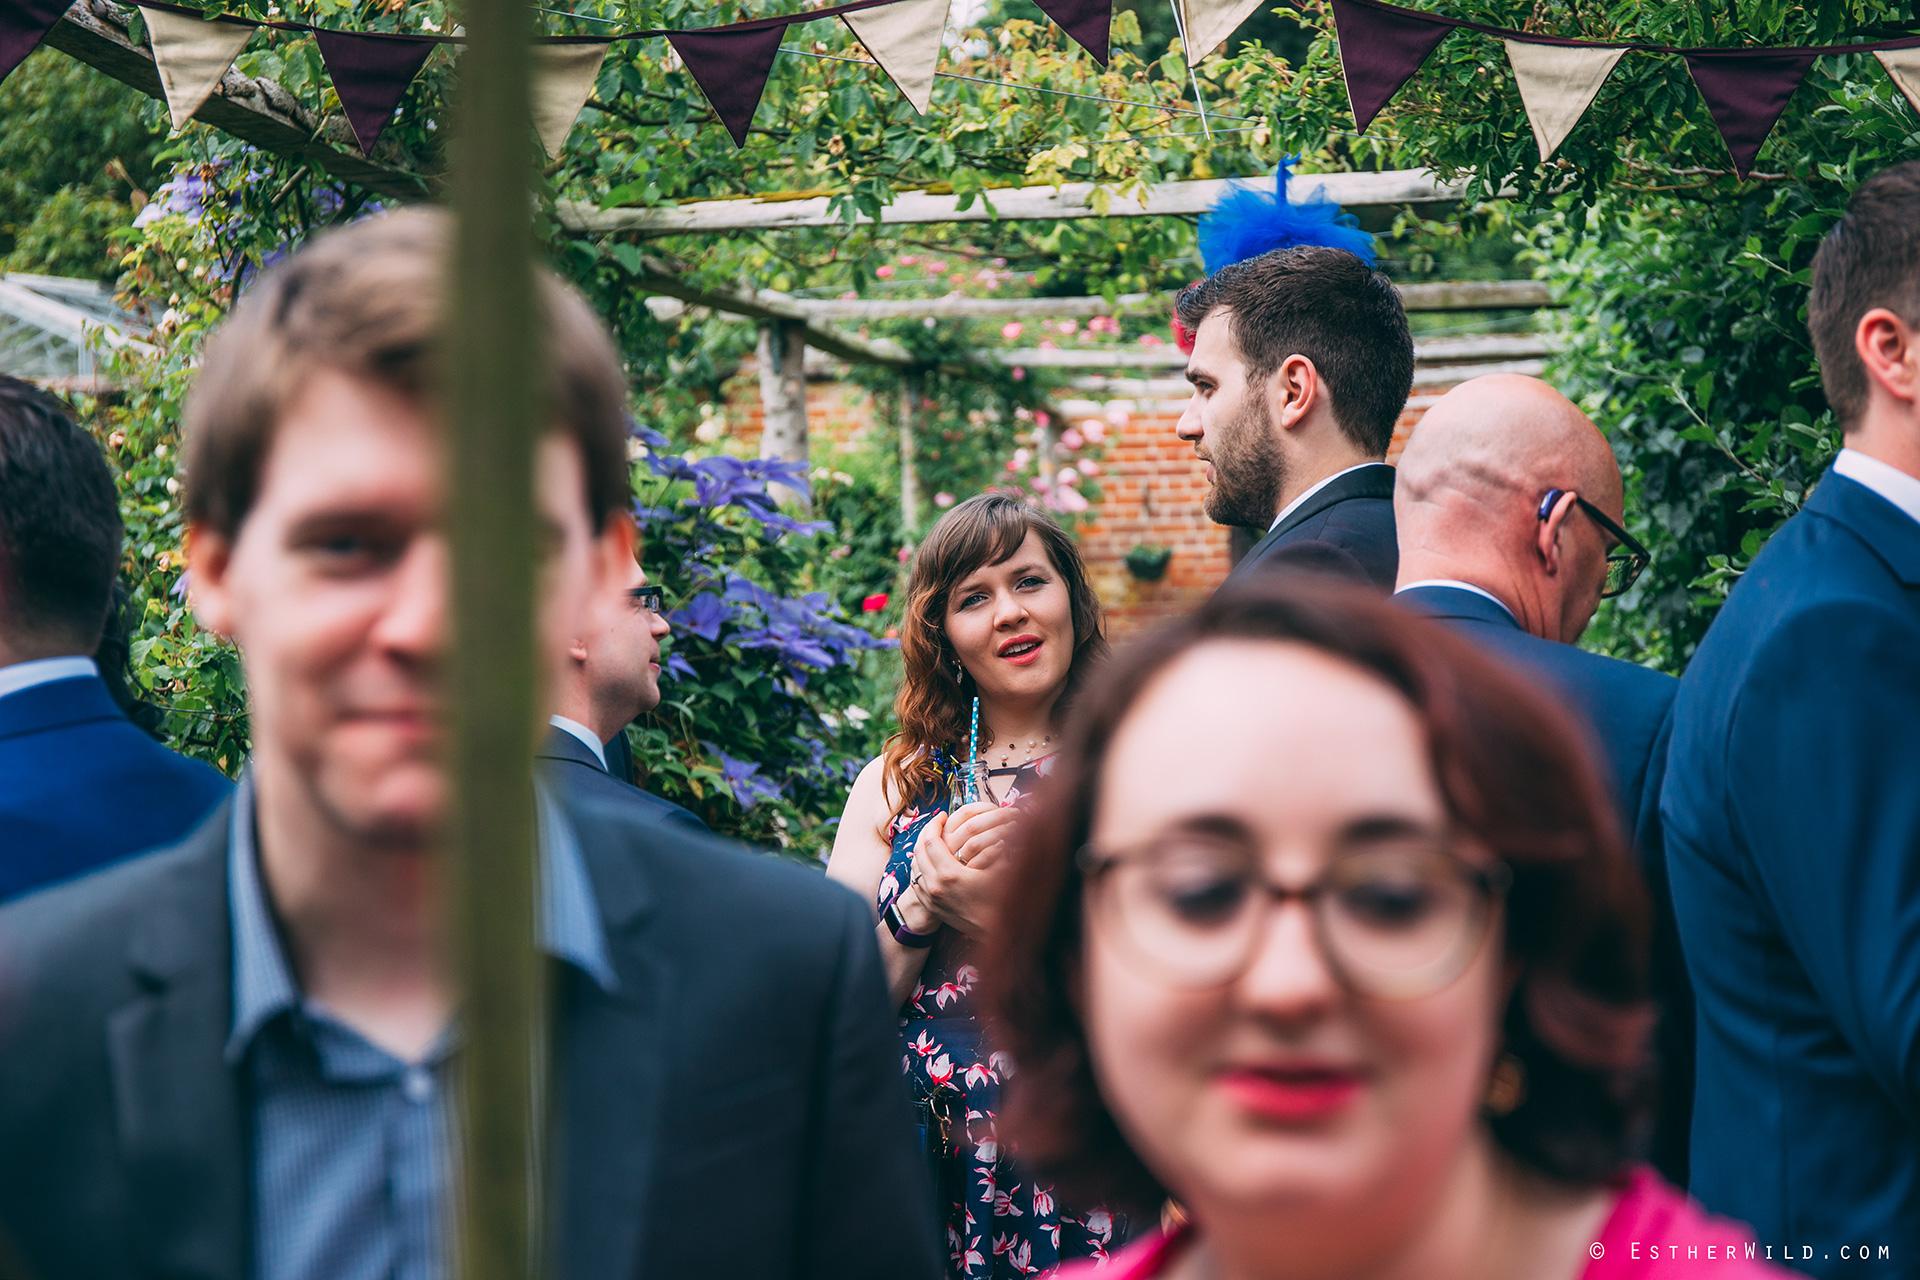 Norfolk_Wedding_Photographer_Mannington_Hall_Country_Esther_Wild_0325.jpg